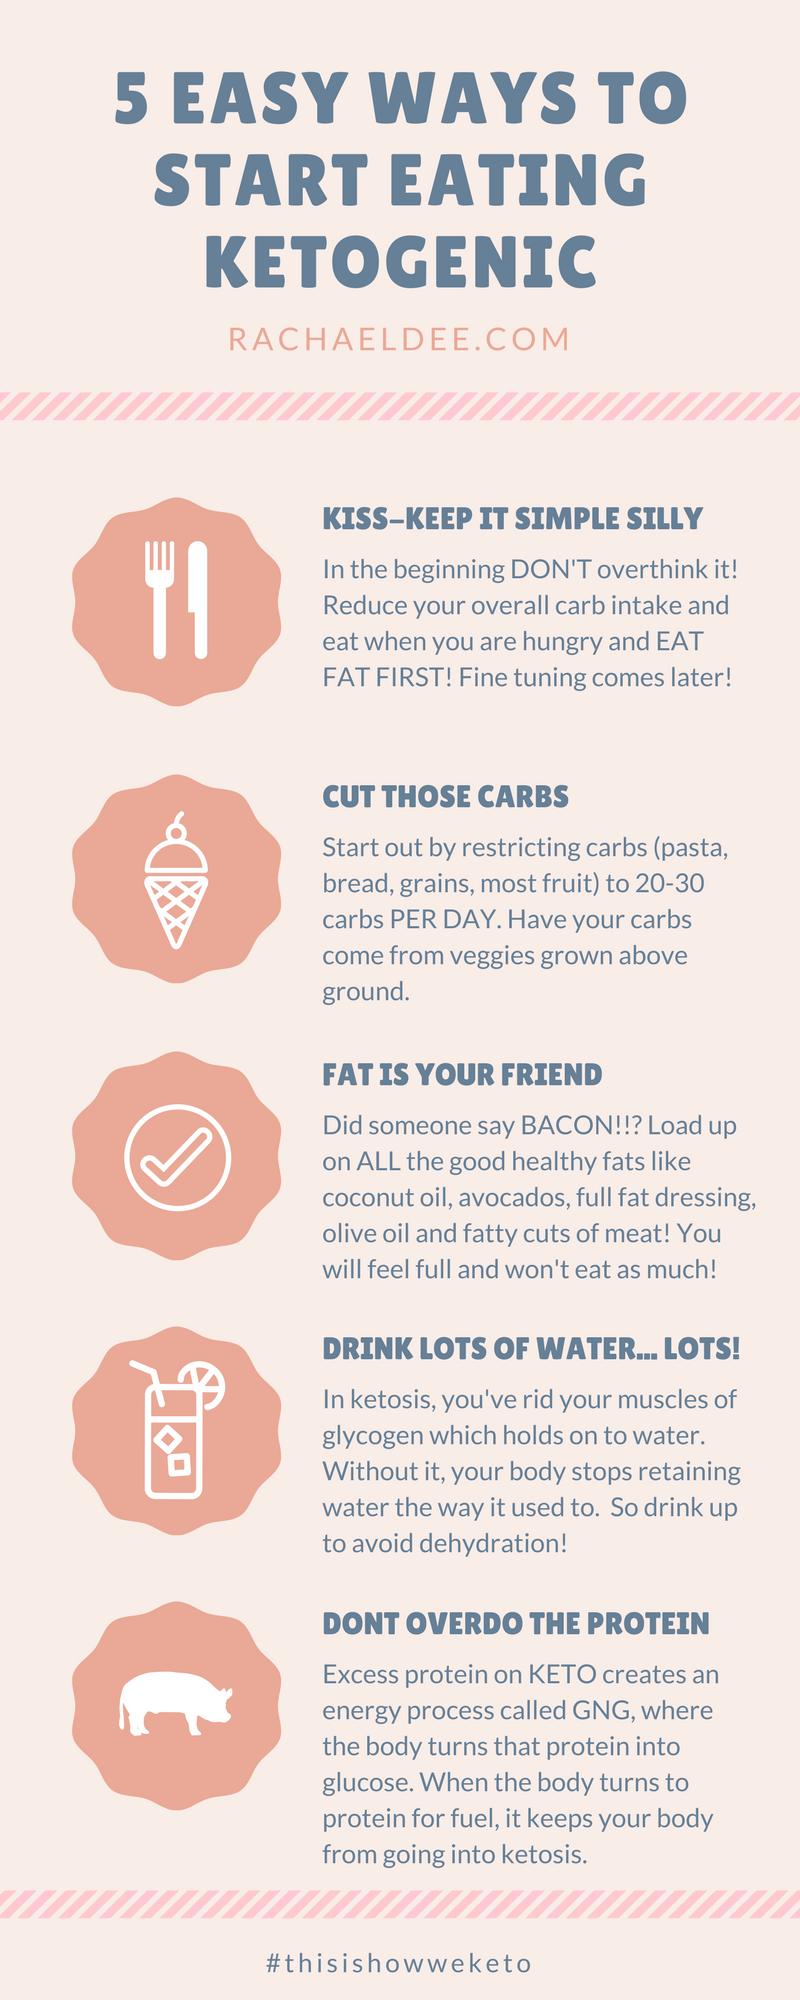 Easy ways to start eating Ketogenic